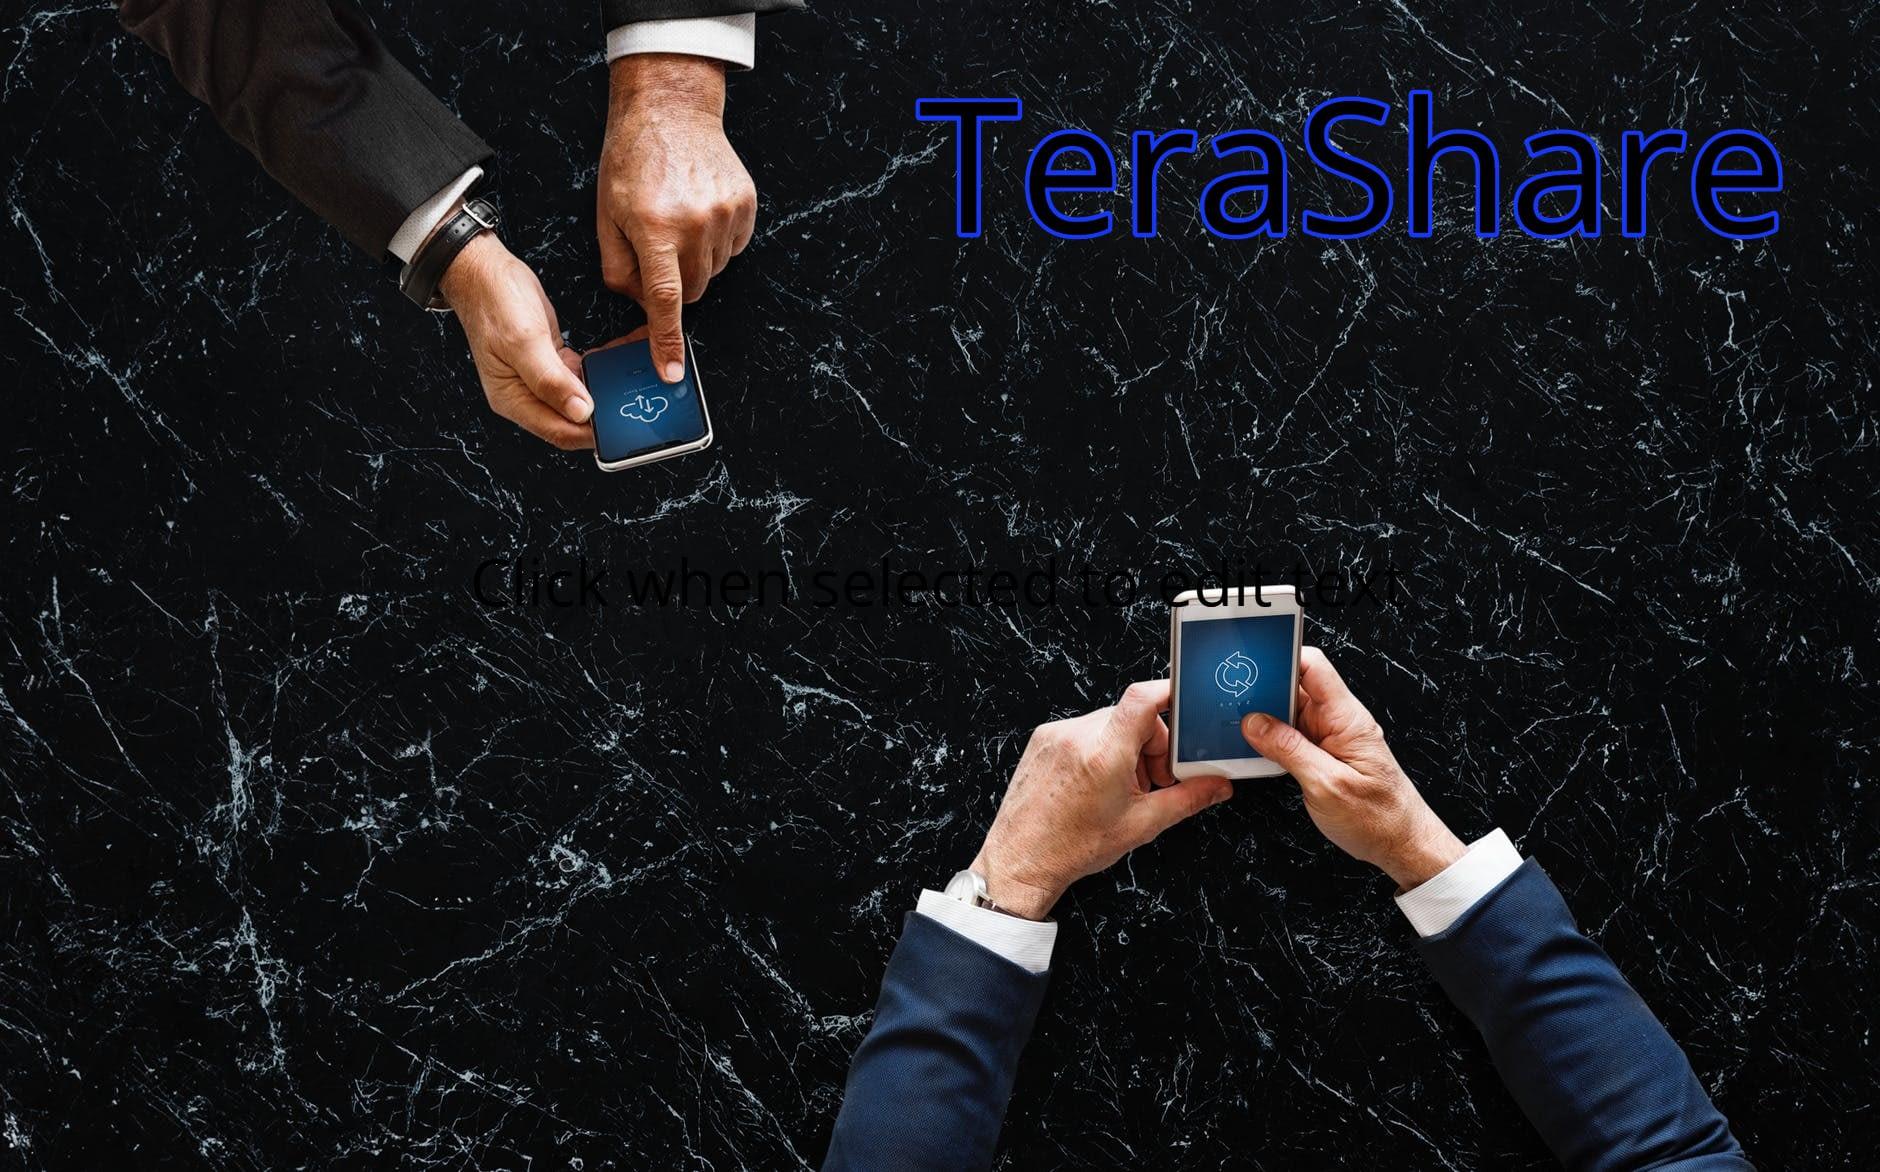 3rd nu TeraShare